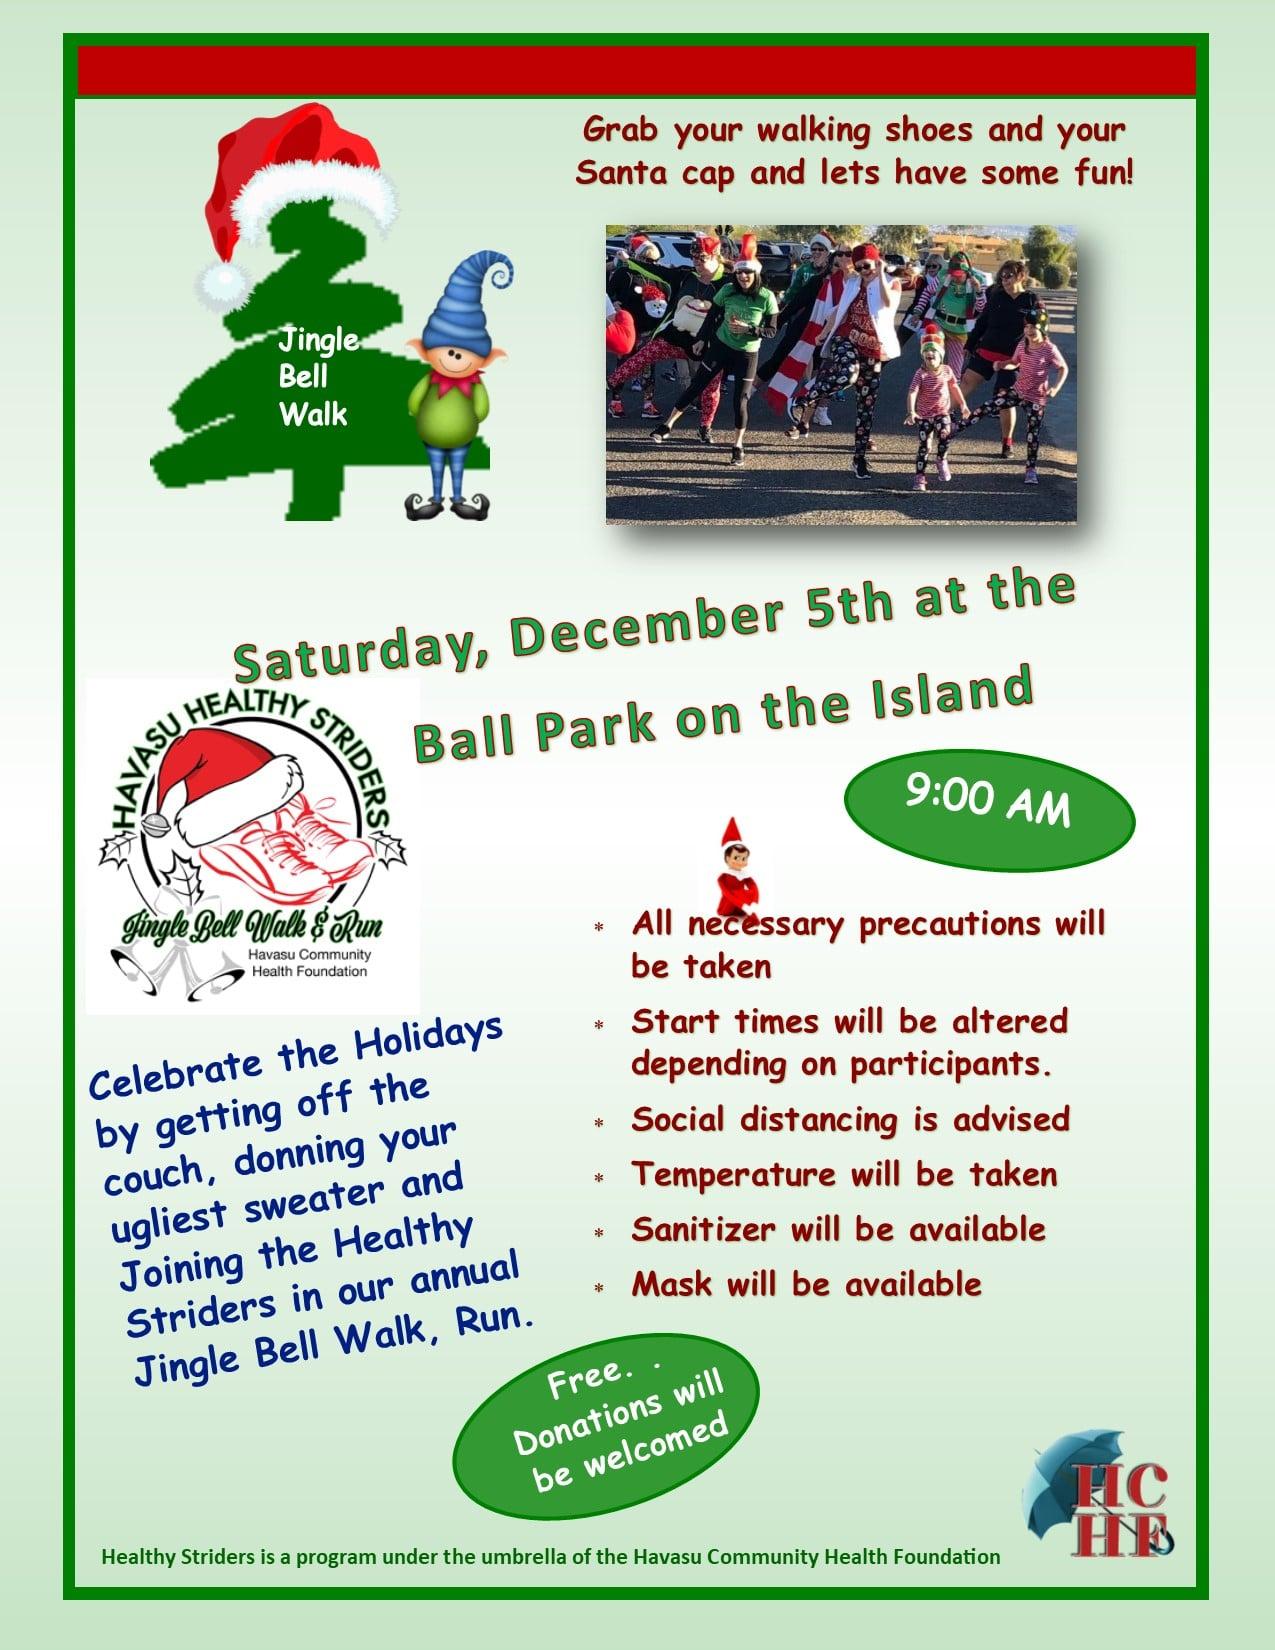 Jingle Bell Walk Run